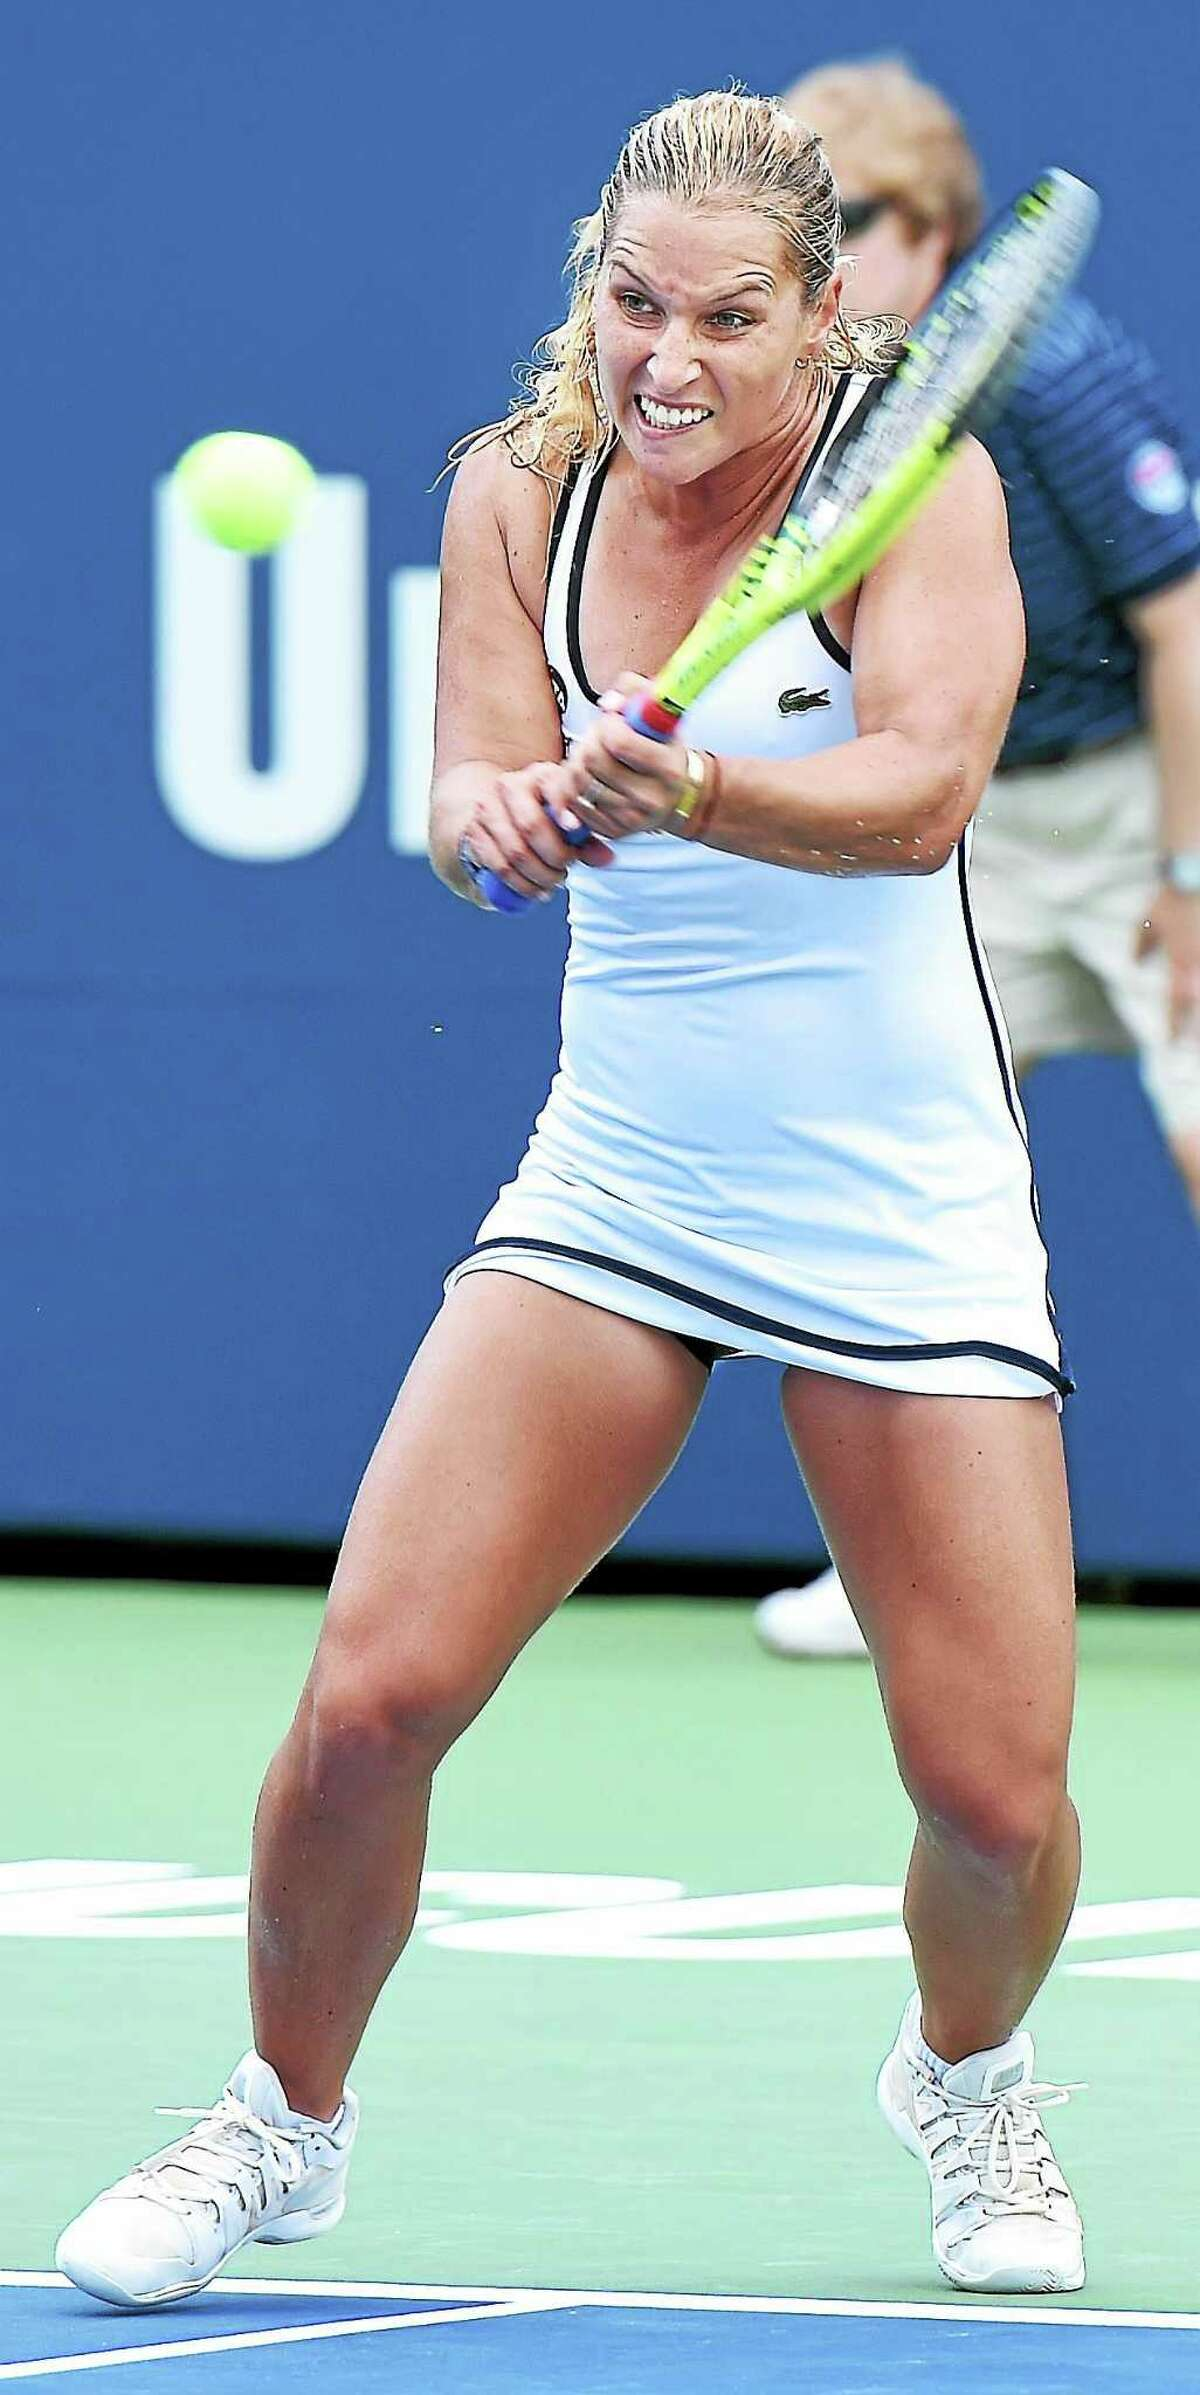 Dominika Cibulkova hits a backhand to Tsvetana Pironkova in the second set of their match at the Connecticut Open on Sunday.